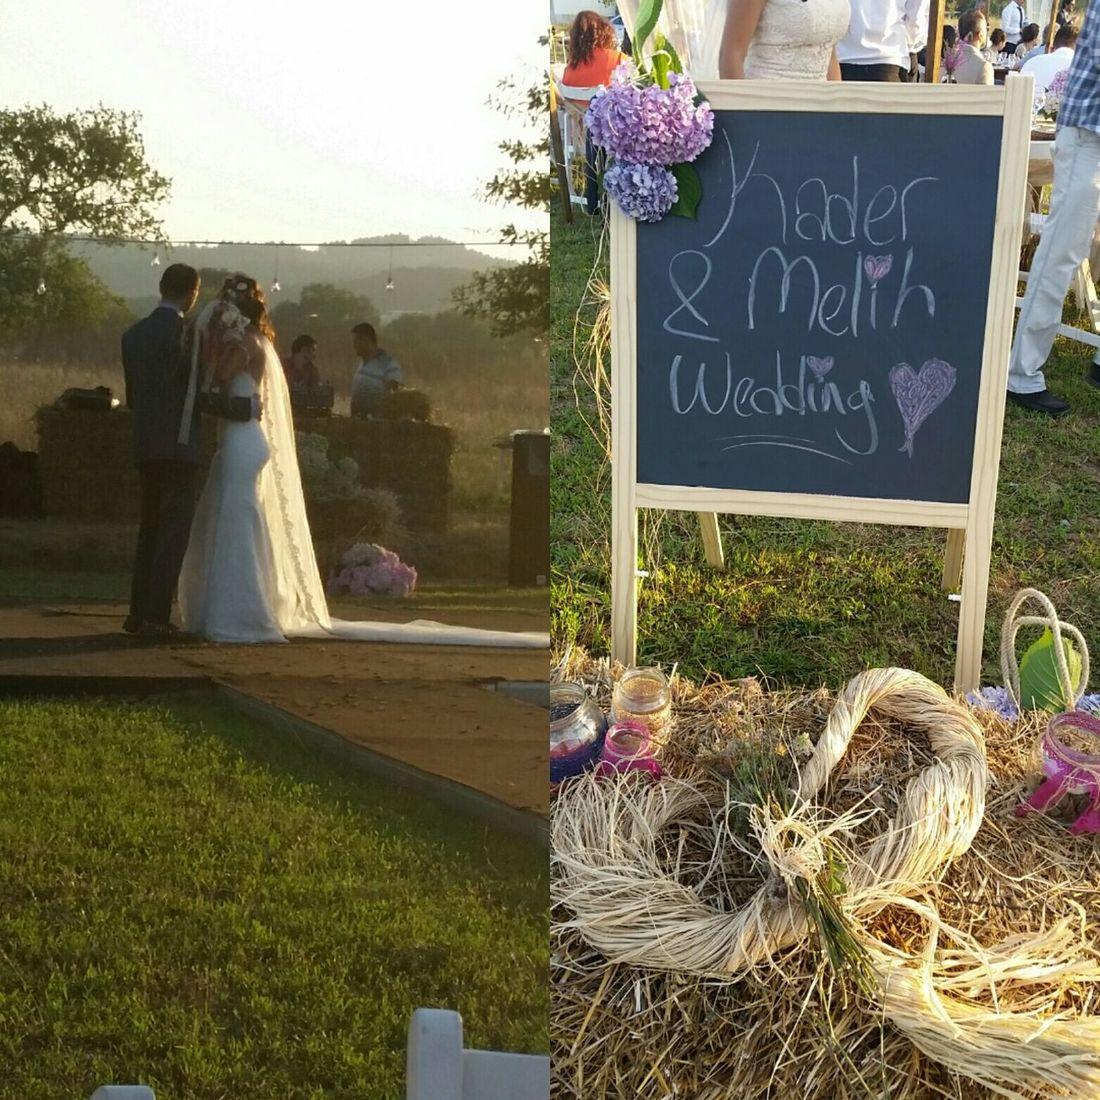 @wedding Gardening Fresh Produce People Watching Excercising Sowing What You Reap